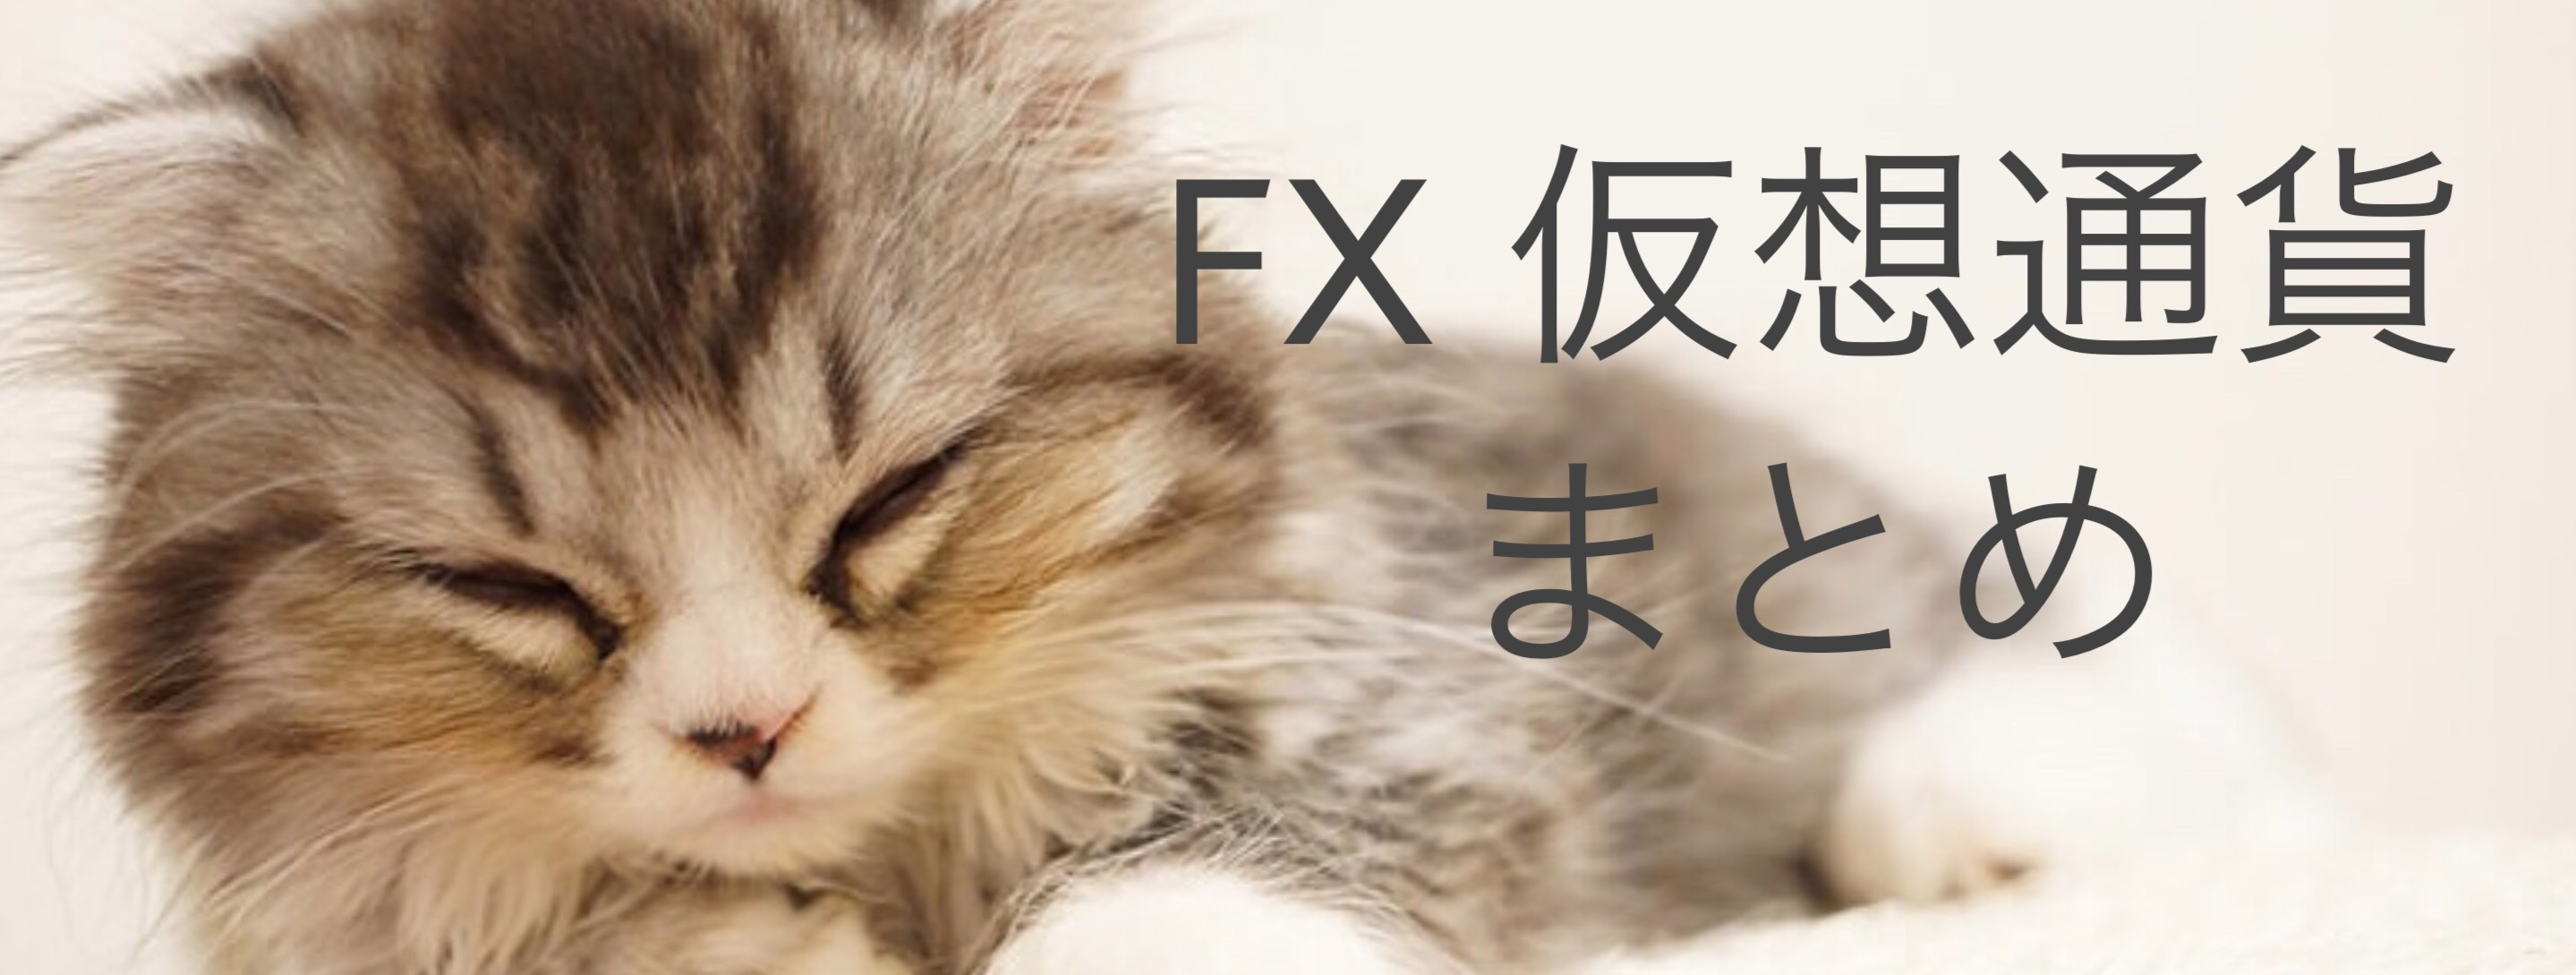 FX 仮想通貨 まとめ